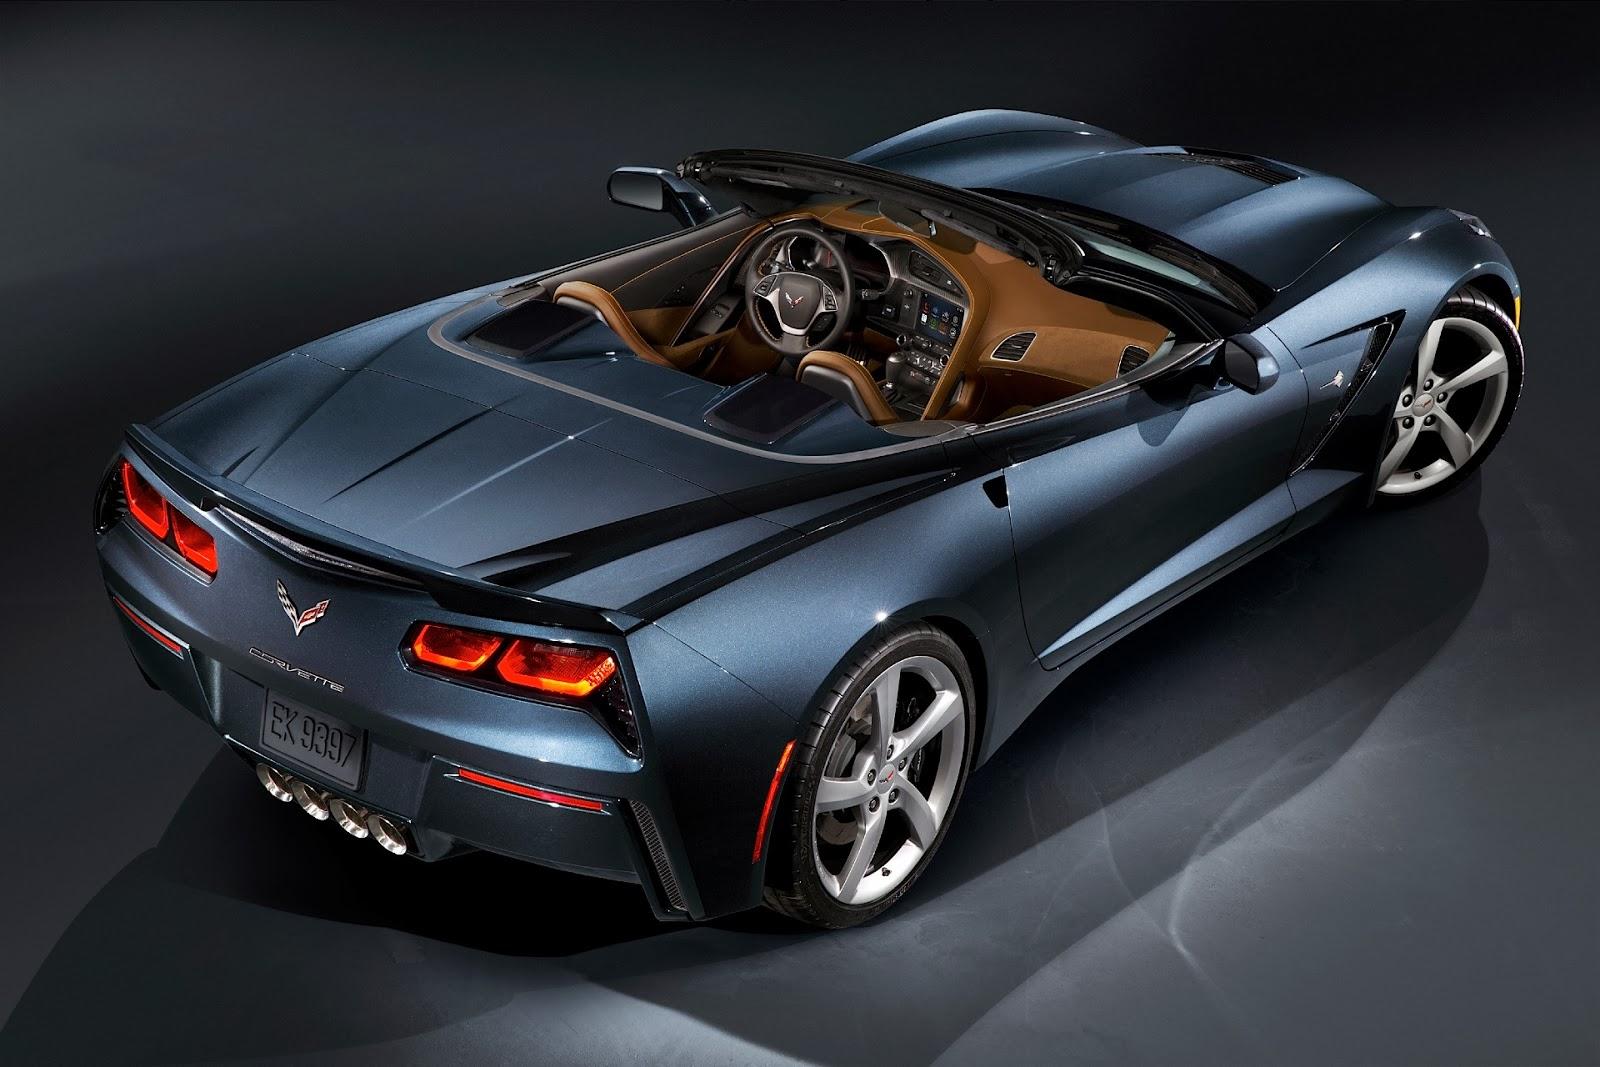 2014 chevrolet corvette c7 stingray convertible sport car auto review 2014. Black Bedroom Furniture Sets. Home Design Ideas